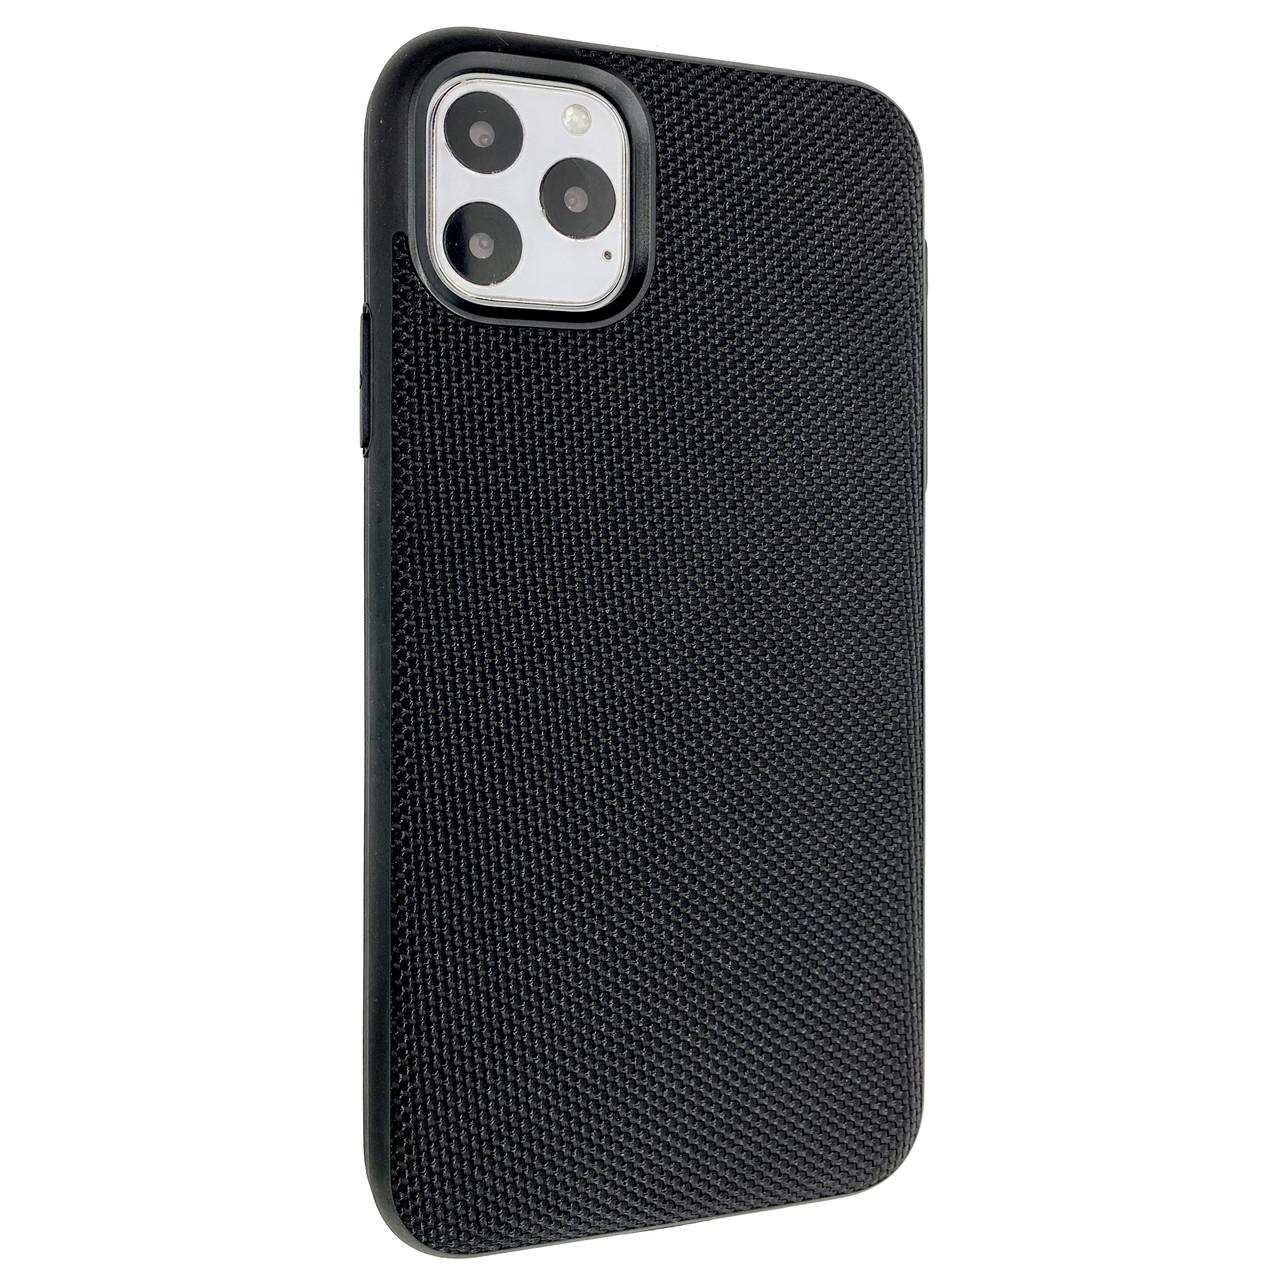 Чехол-накладка DK Silicone Nylon Case для Apple iPhone 11 Pro Max (black)